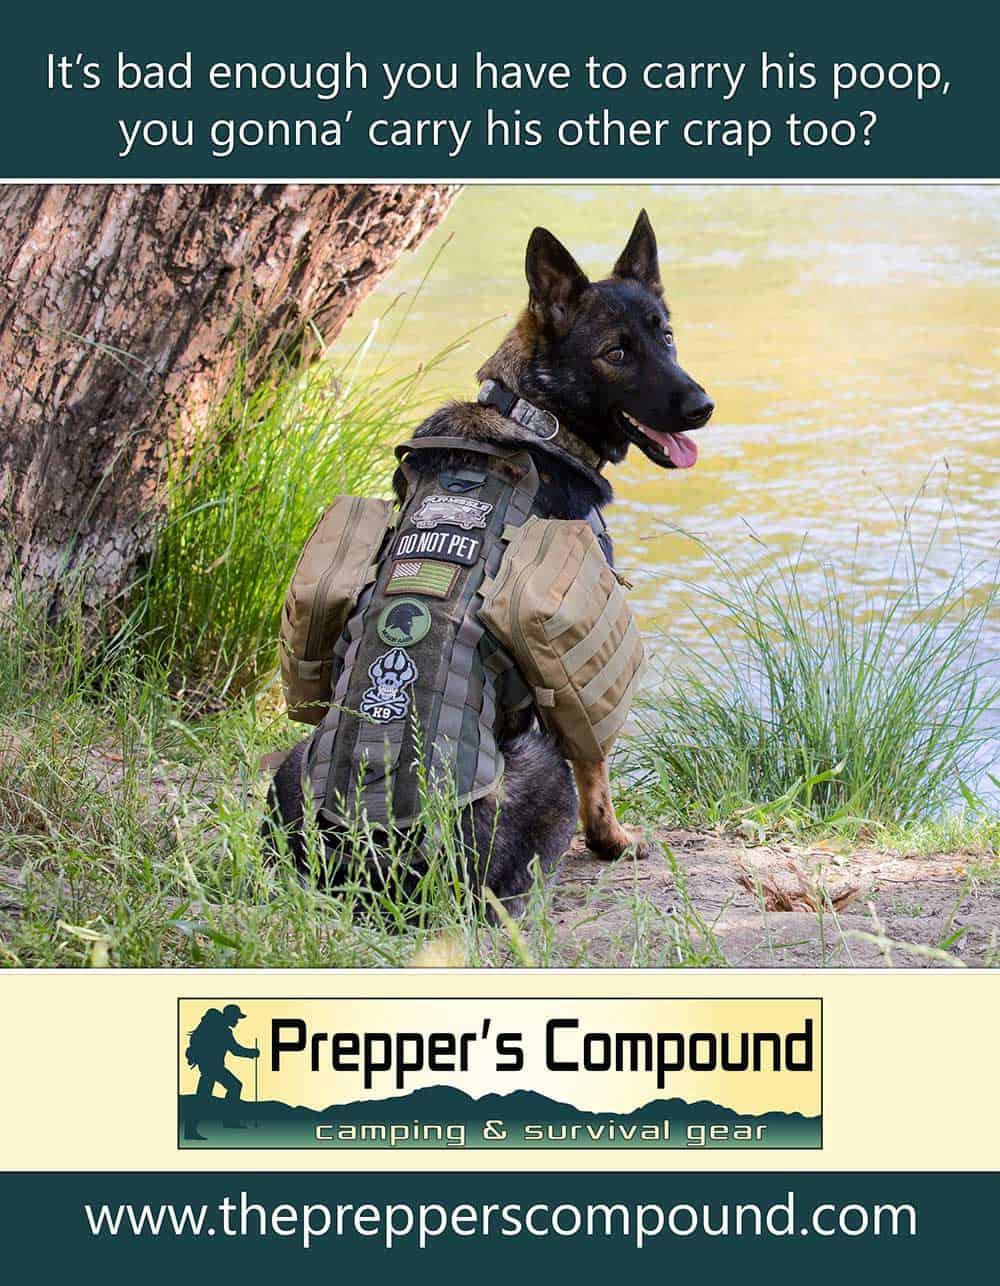 Tabletop Sign Showing Dog Packs for E-Commerce Website